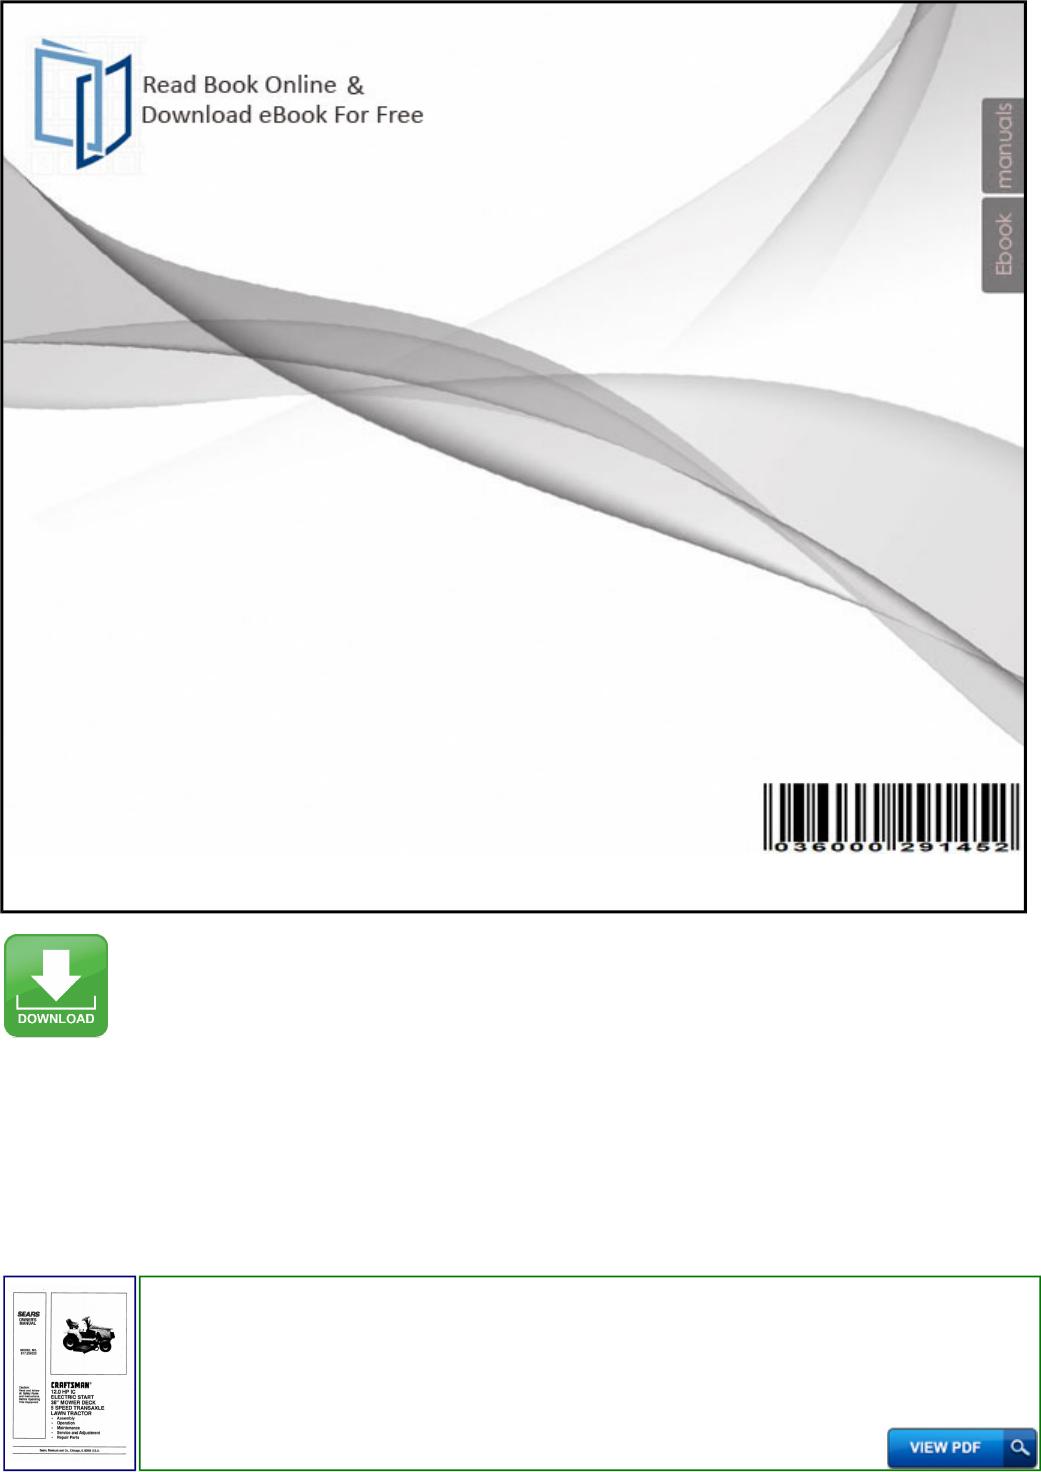 Sears Owner Manual Craftsman Import 100809 Productmanualguide com !!